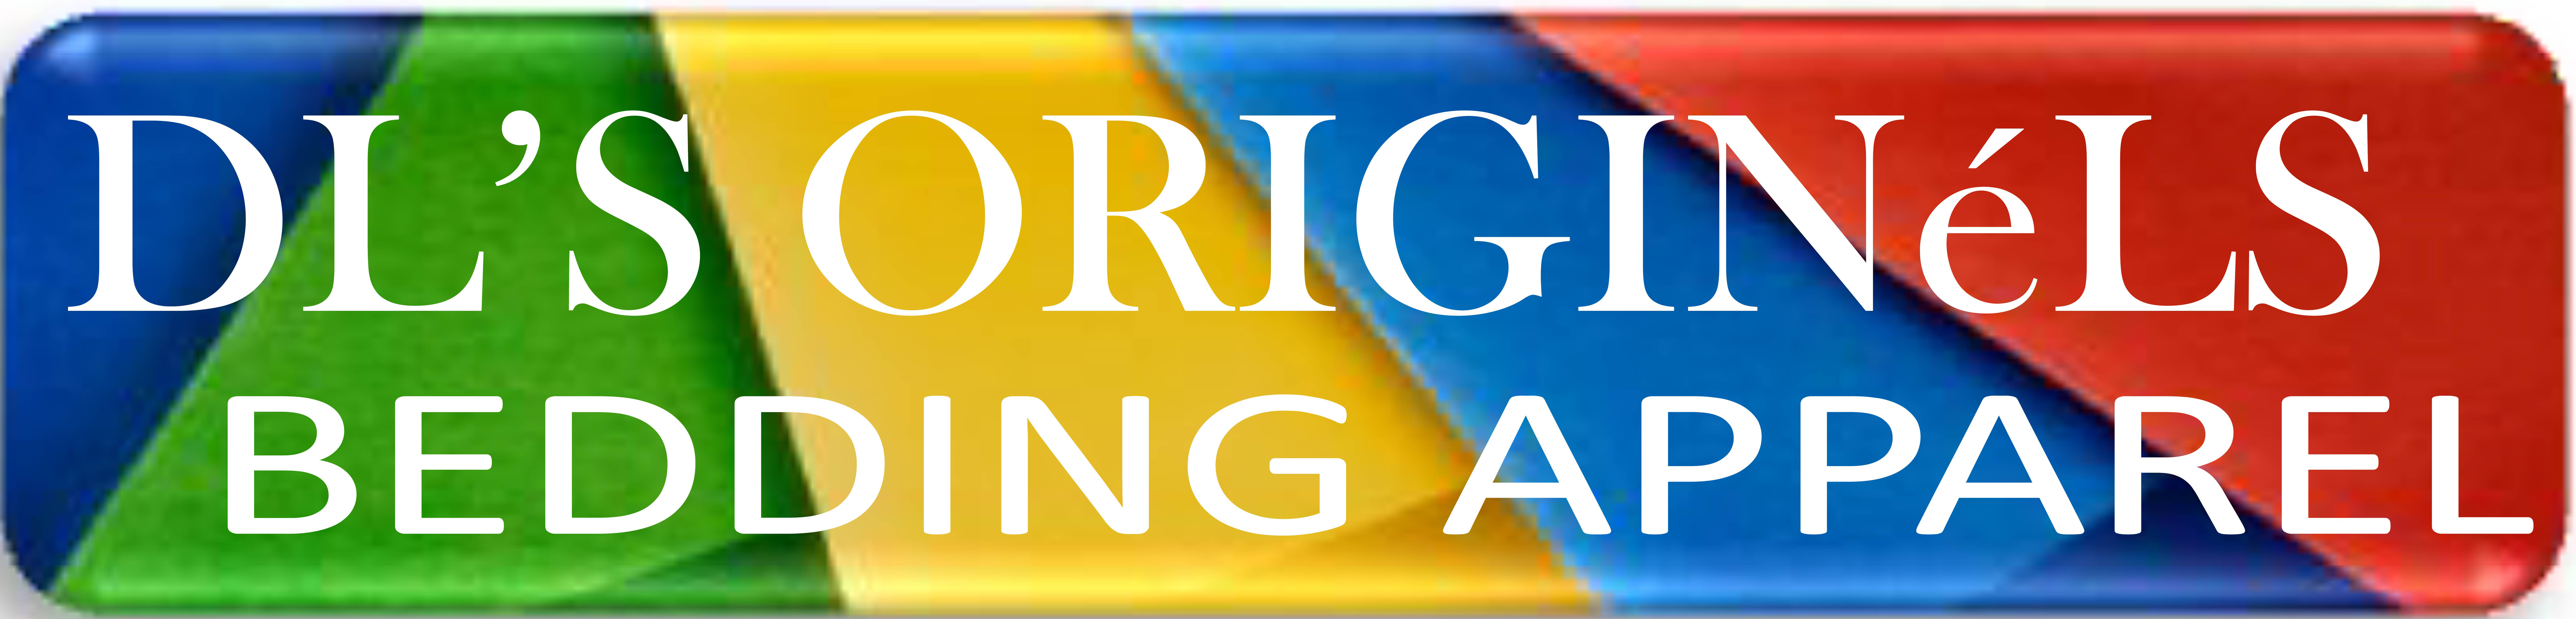 dl-s-originels-logo-cropped.jpg